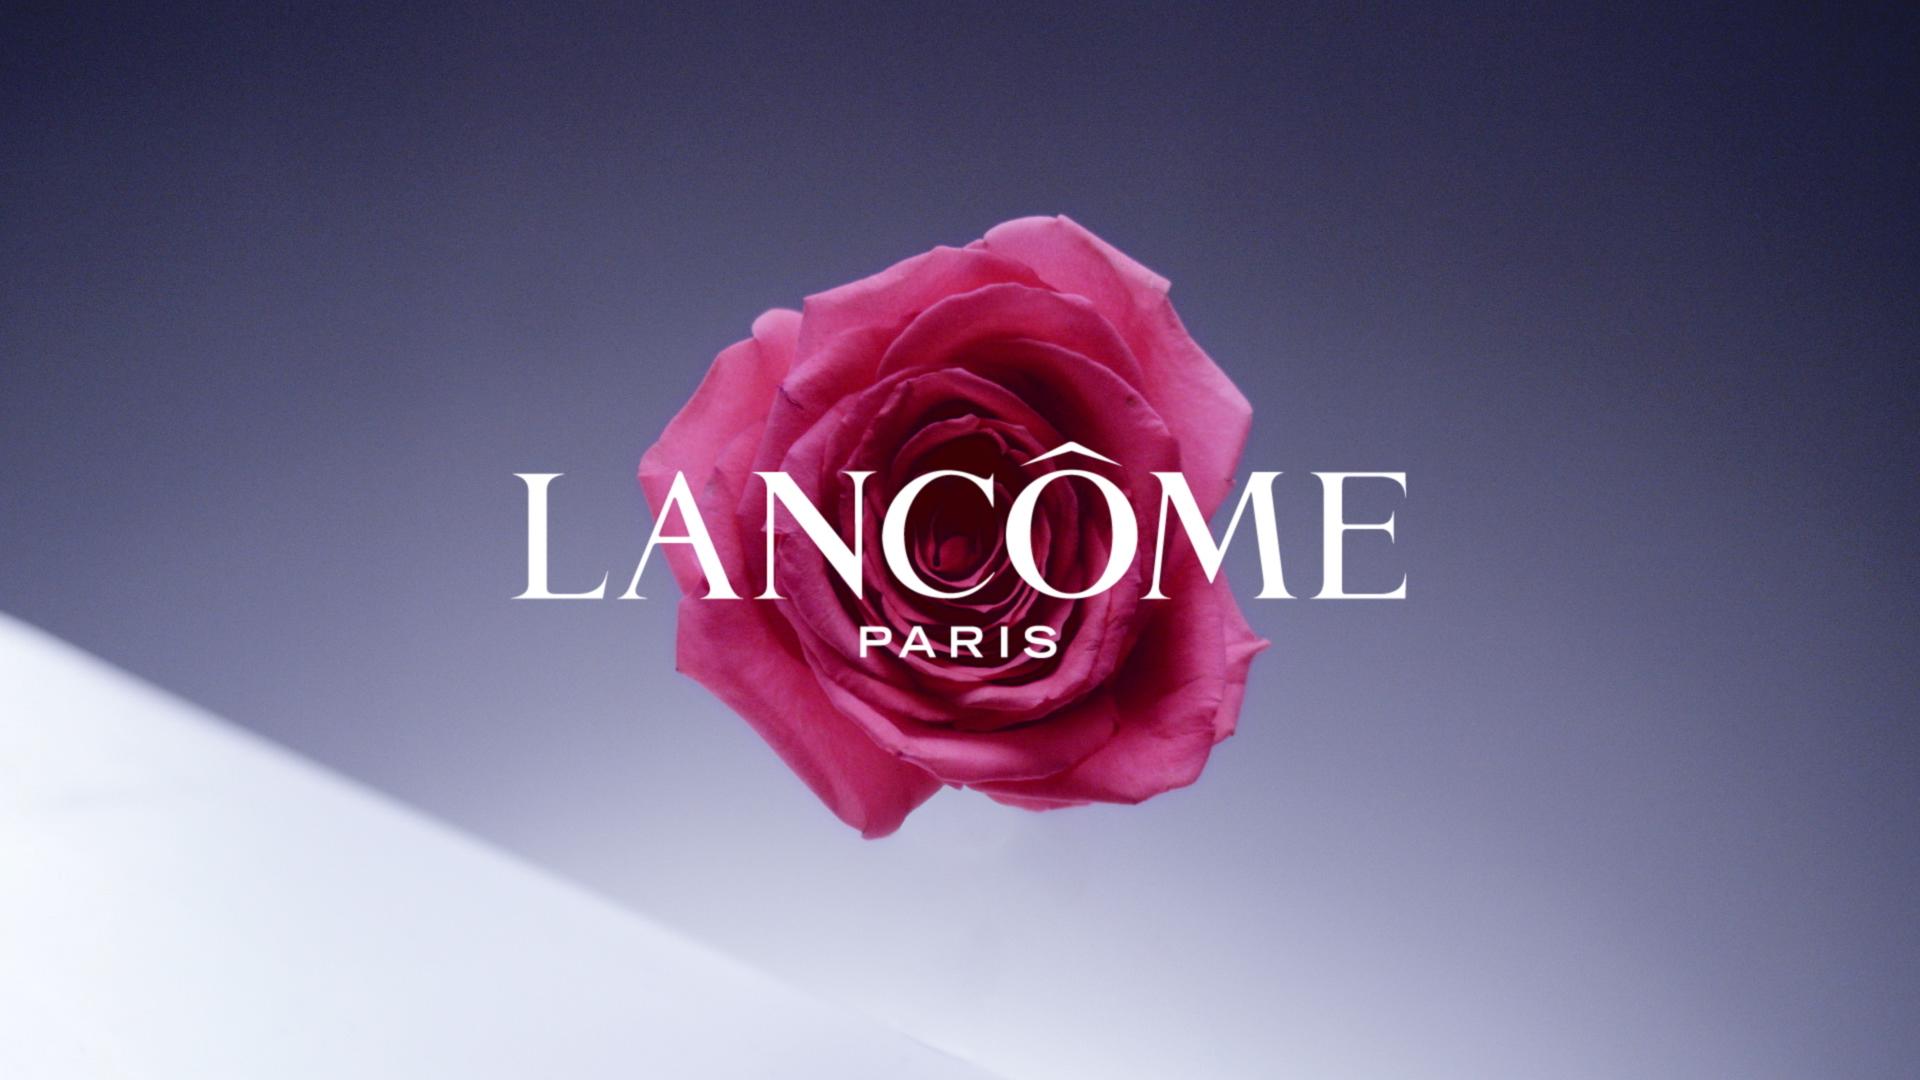 Lancome_1